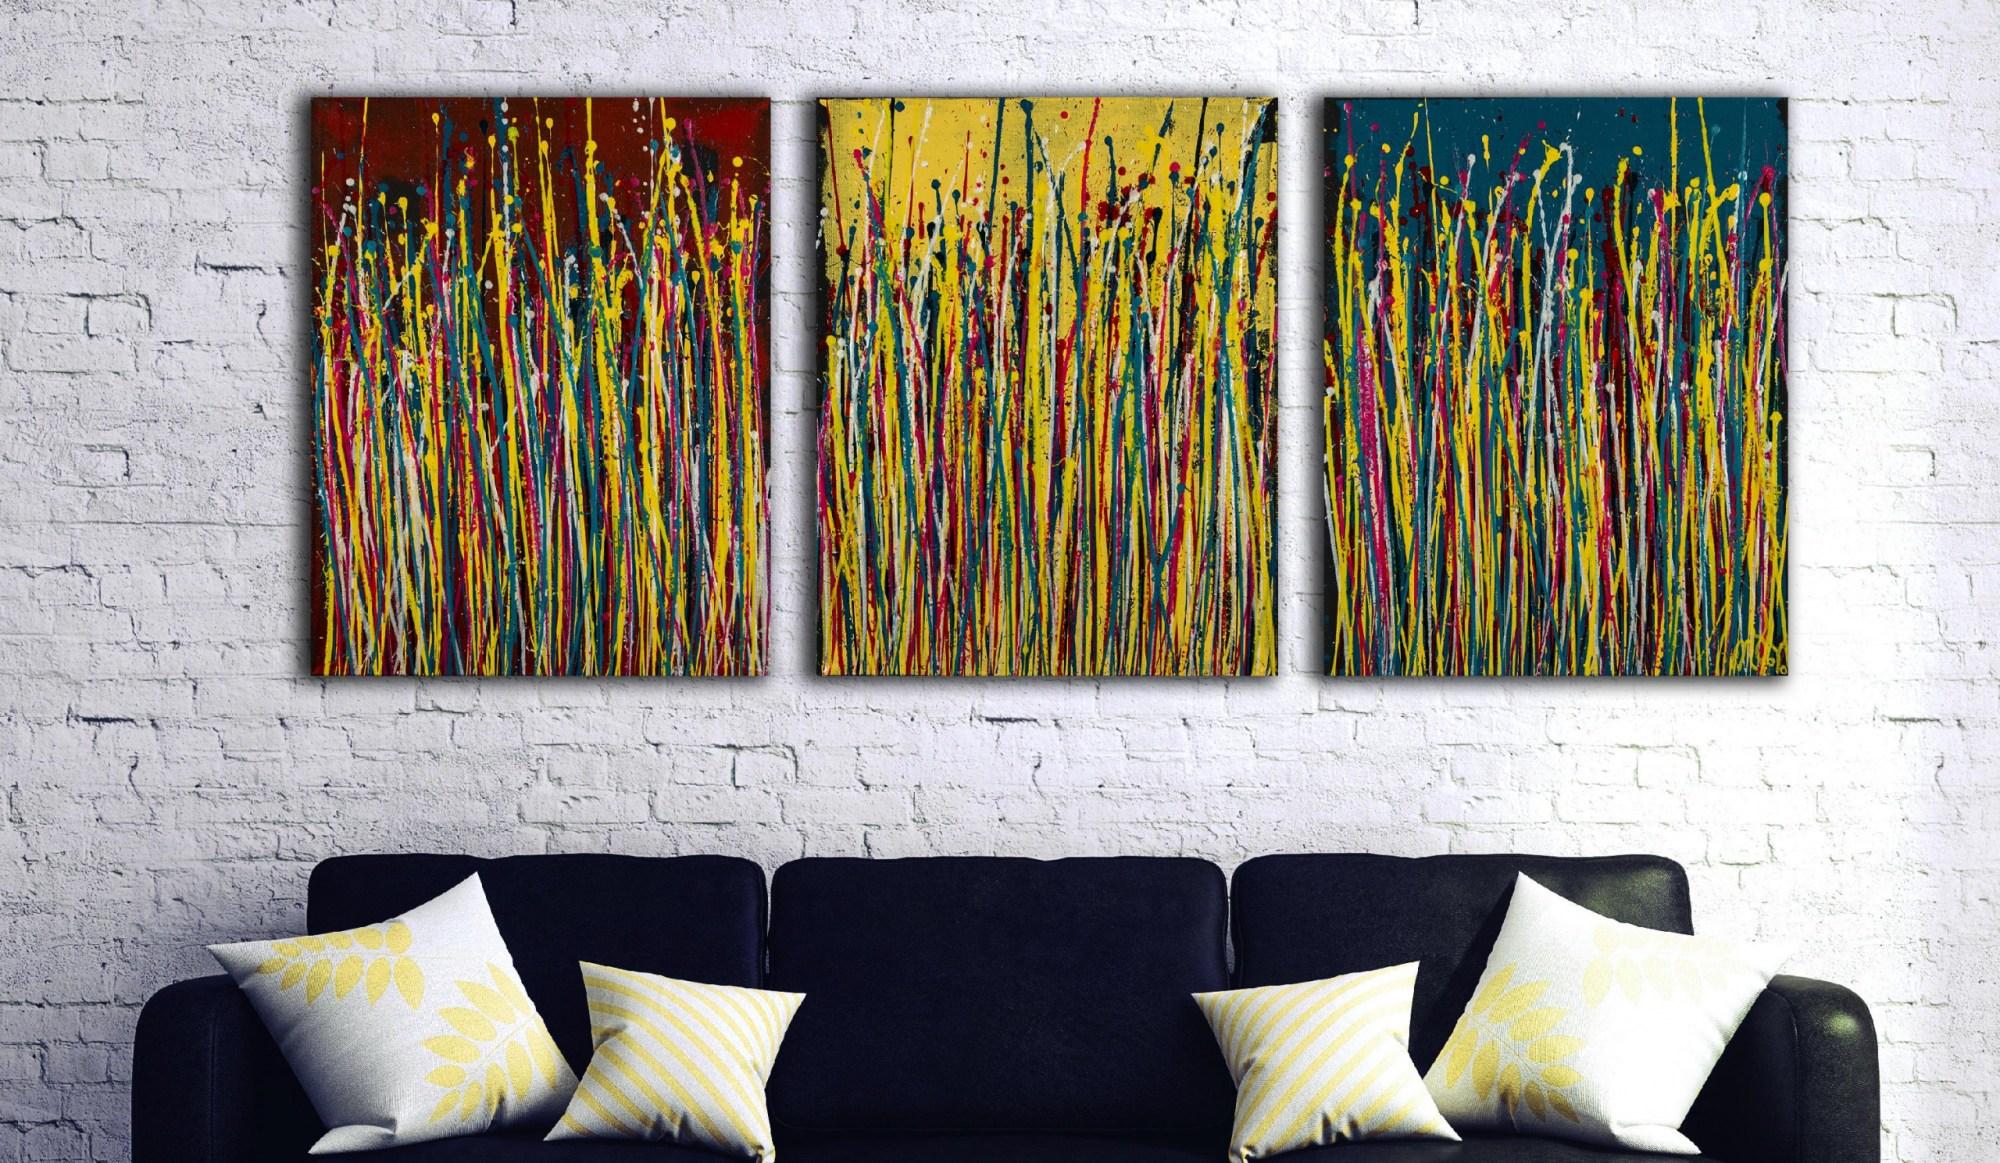 Natures Imagery (Scattering Colors) 2 (2021) / Artist Nestor Toro